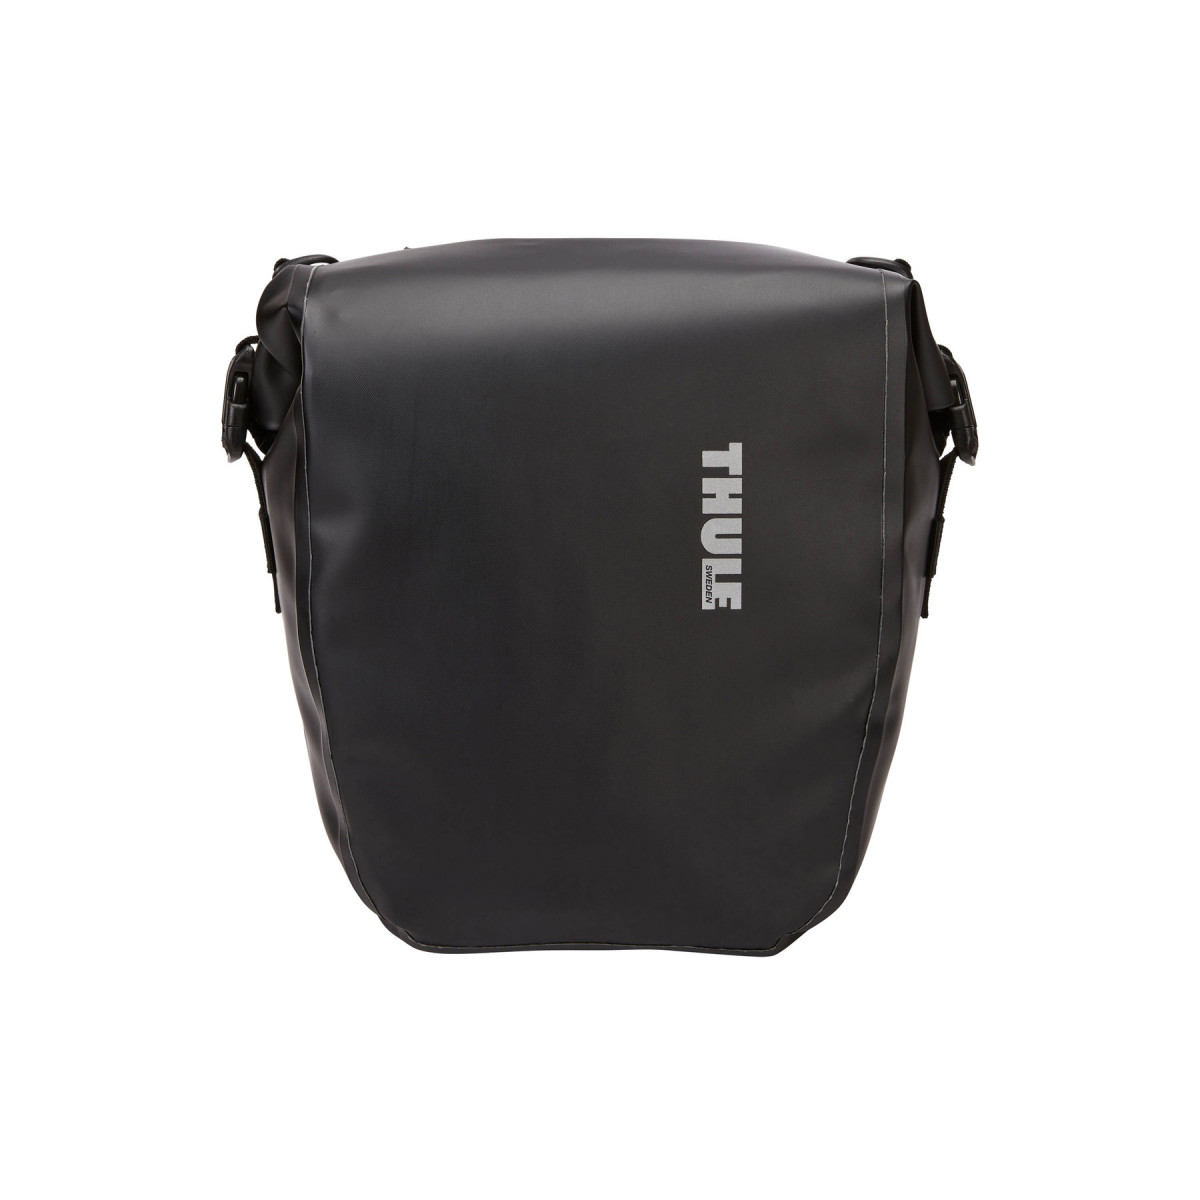 Thule Shield Pannier 13L krepšiai - Black, 2 vnt